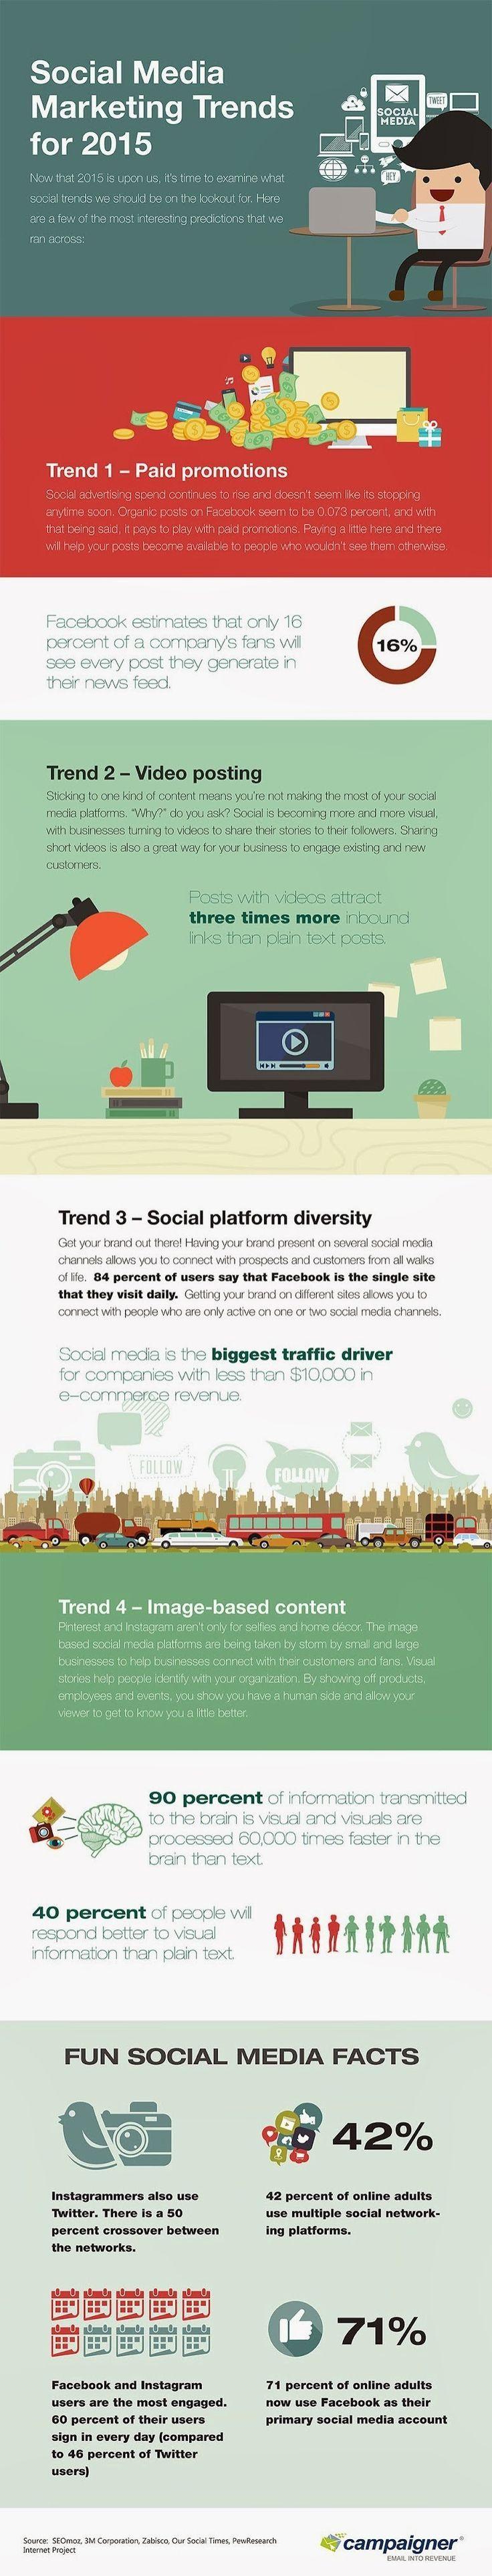 "SOCIAL MEDIA - ""SocialMedia Marketing Trends For 2015 - infographic."""